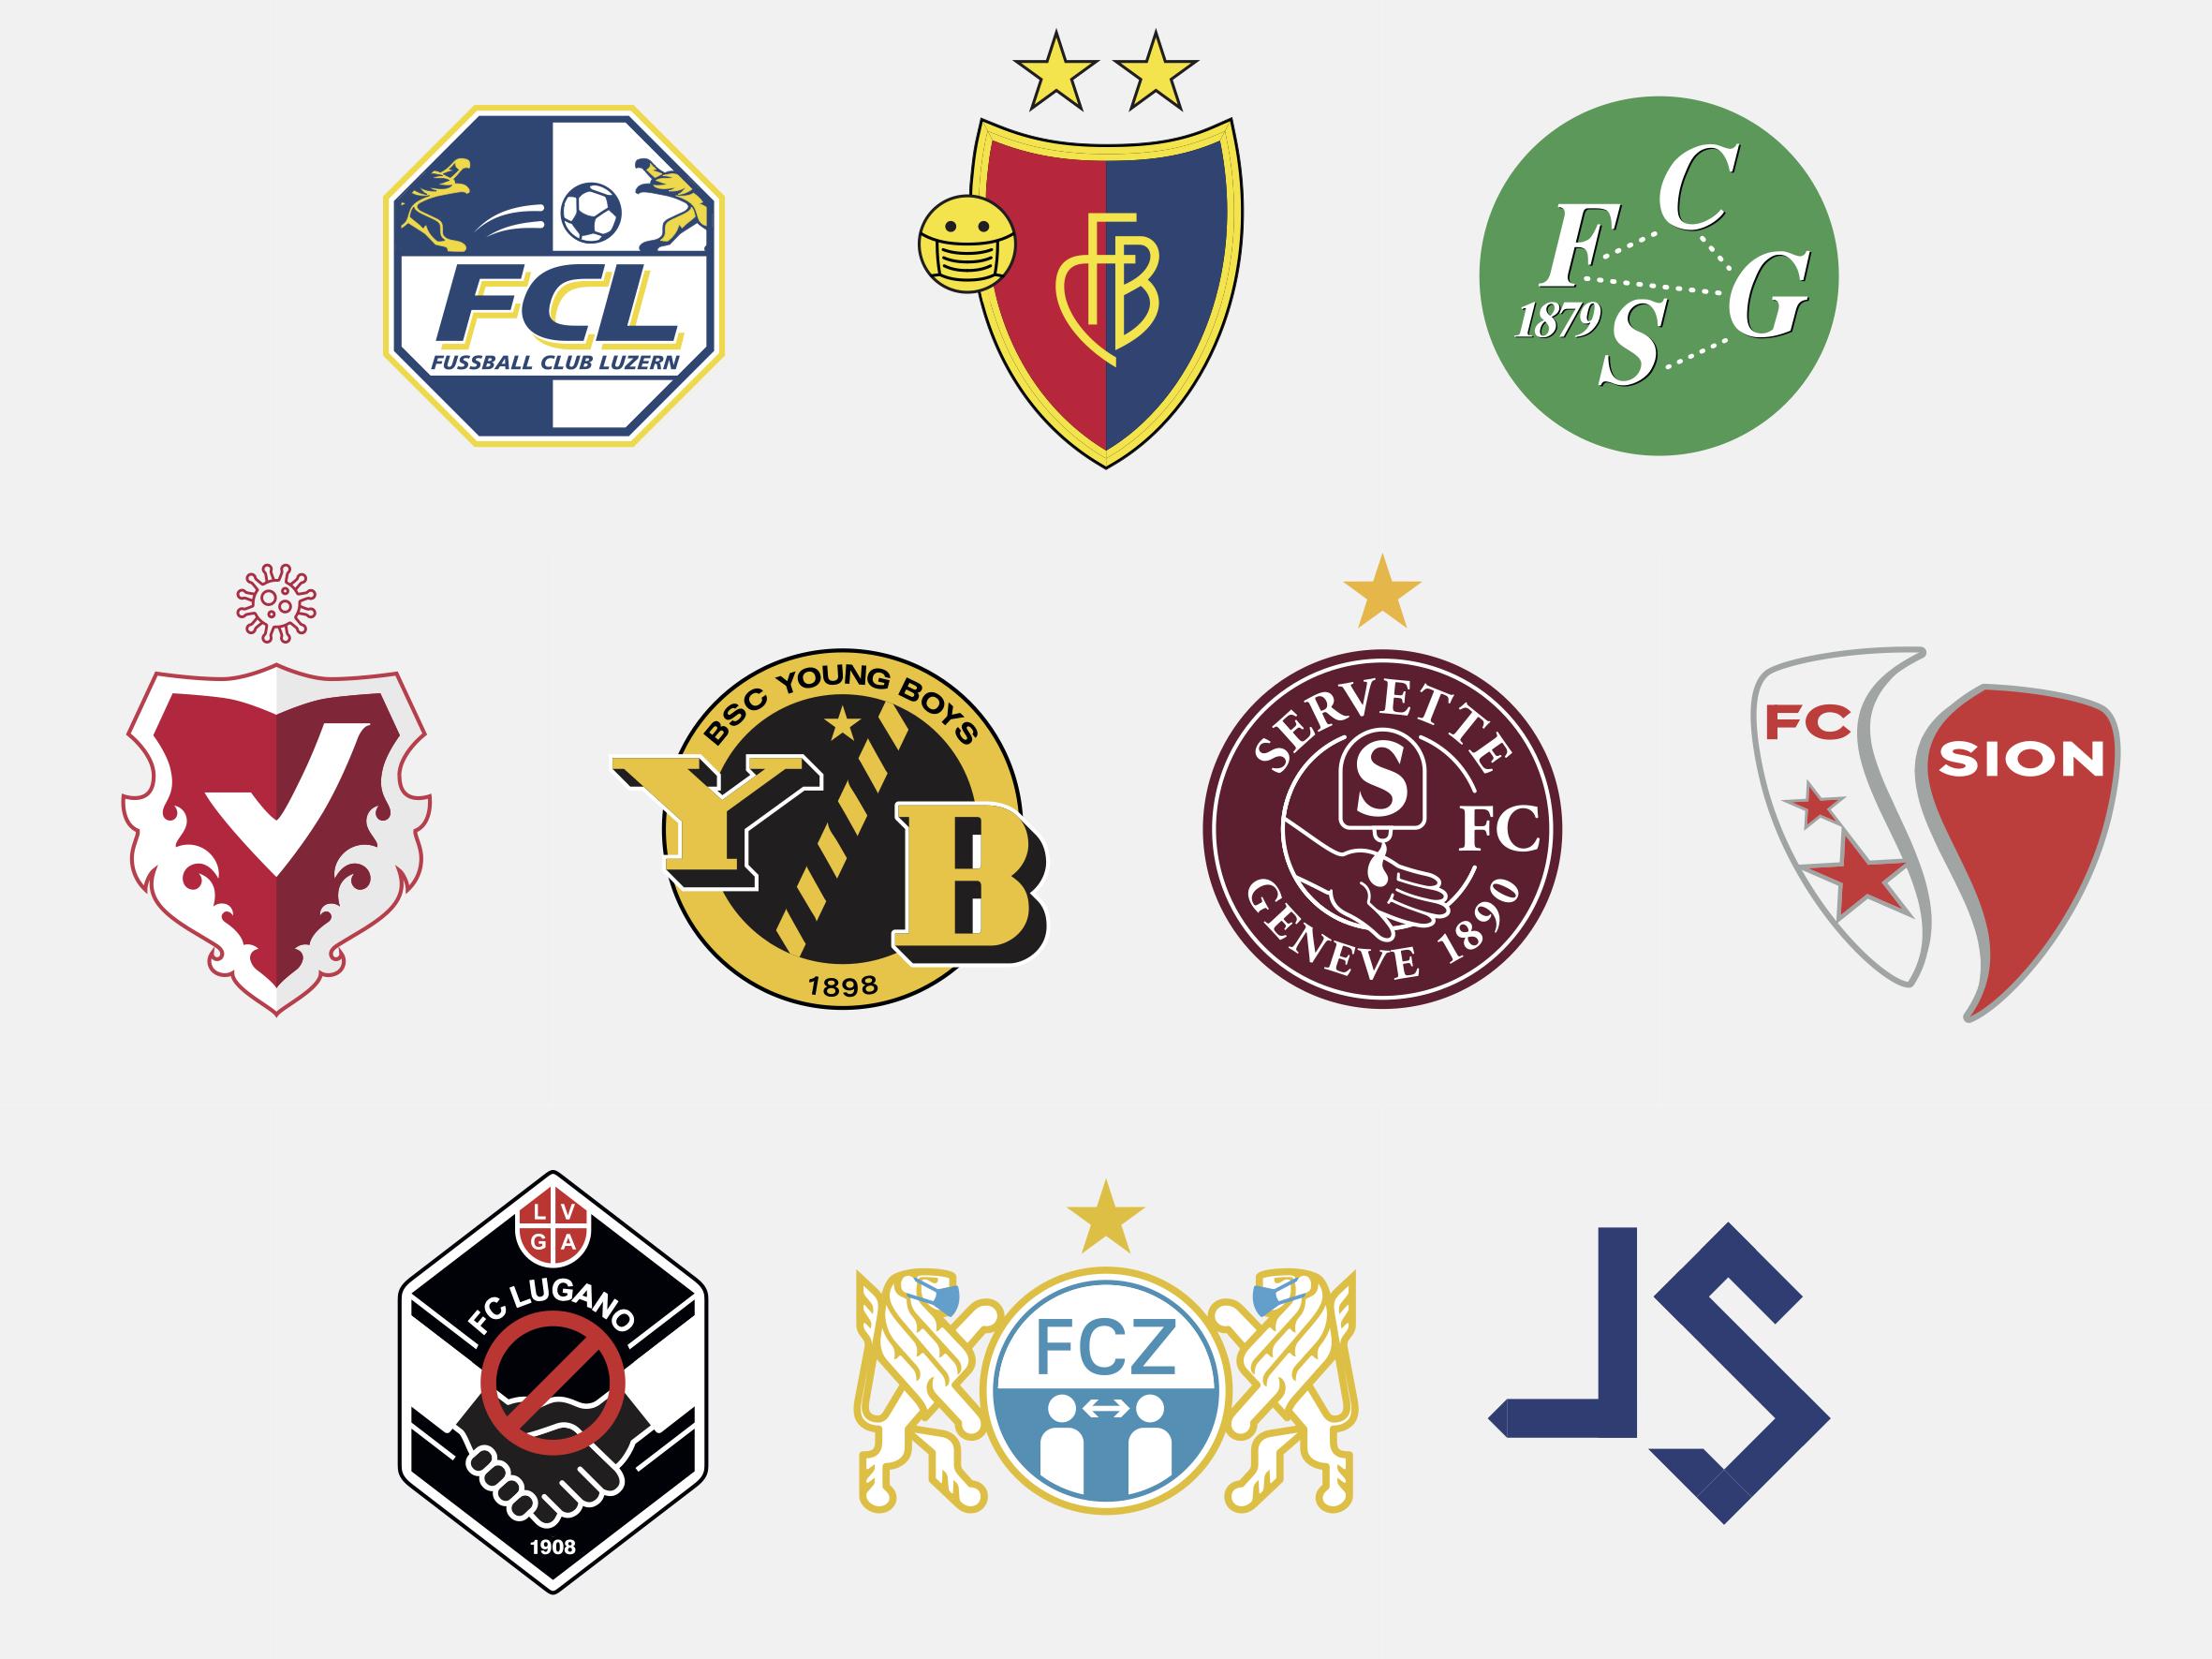 MetK_Superleague_Logos_Übersicht